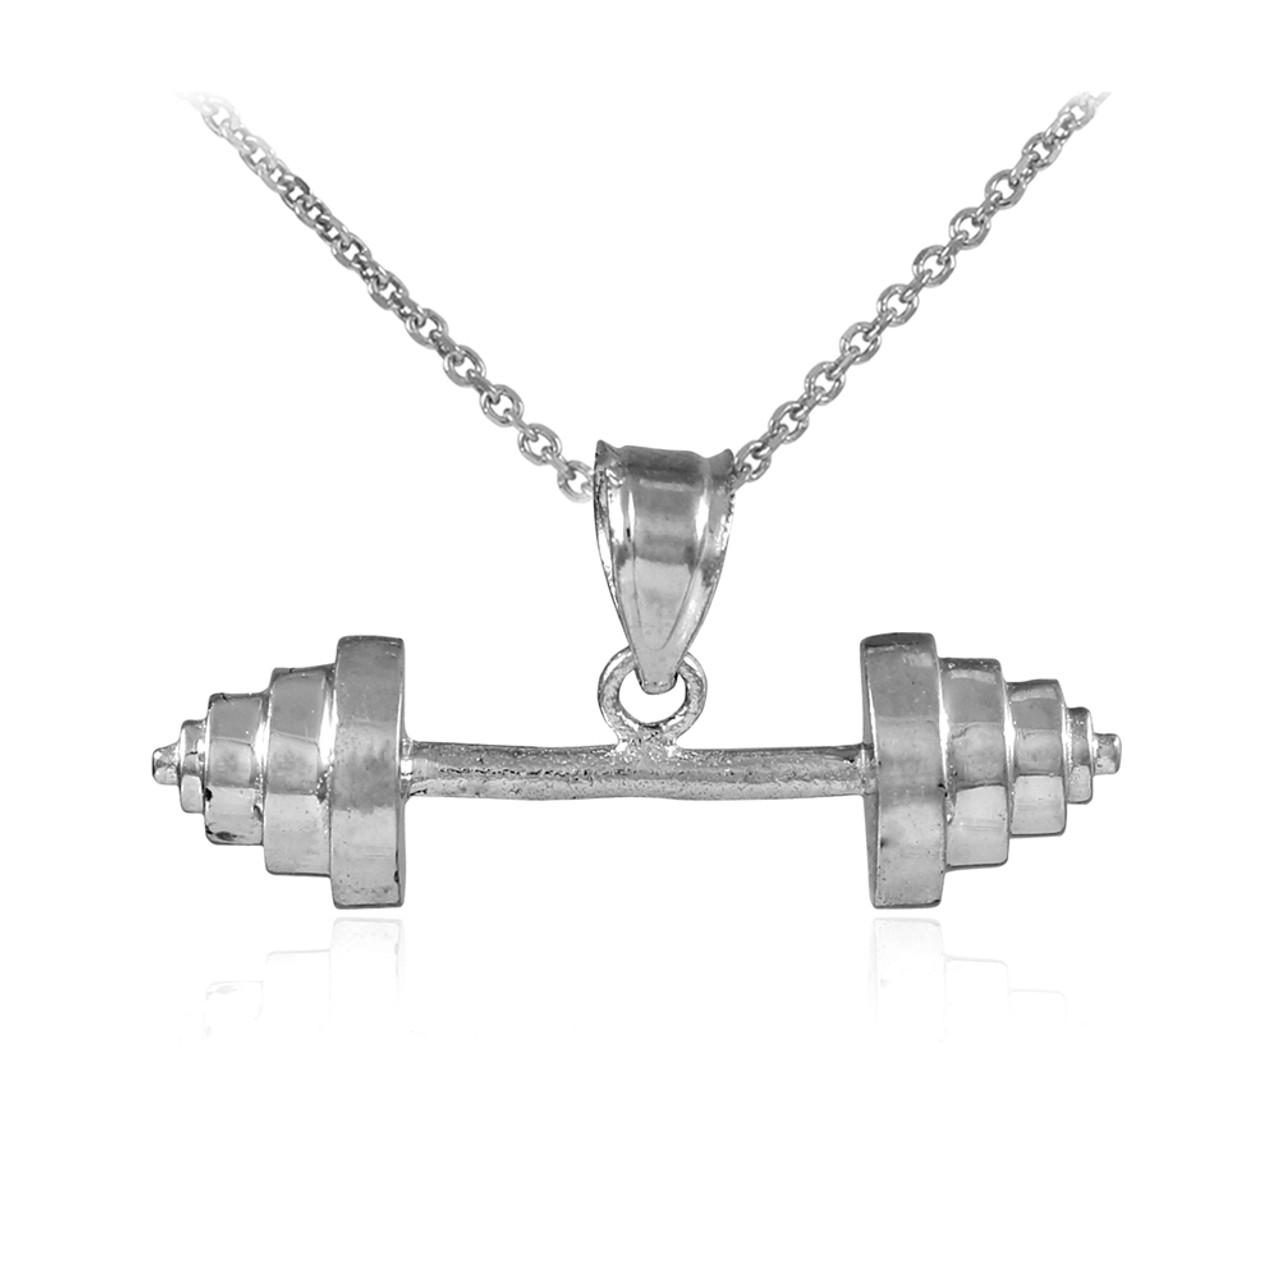 Silver Dumbbell Charm Sports Pendant